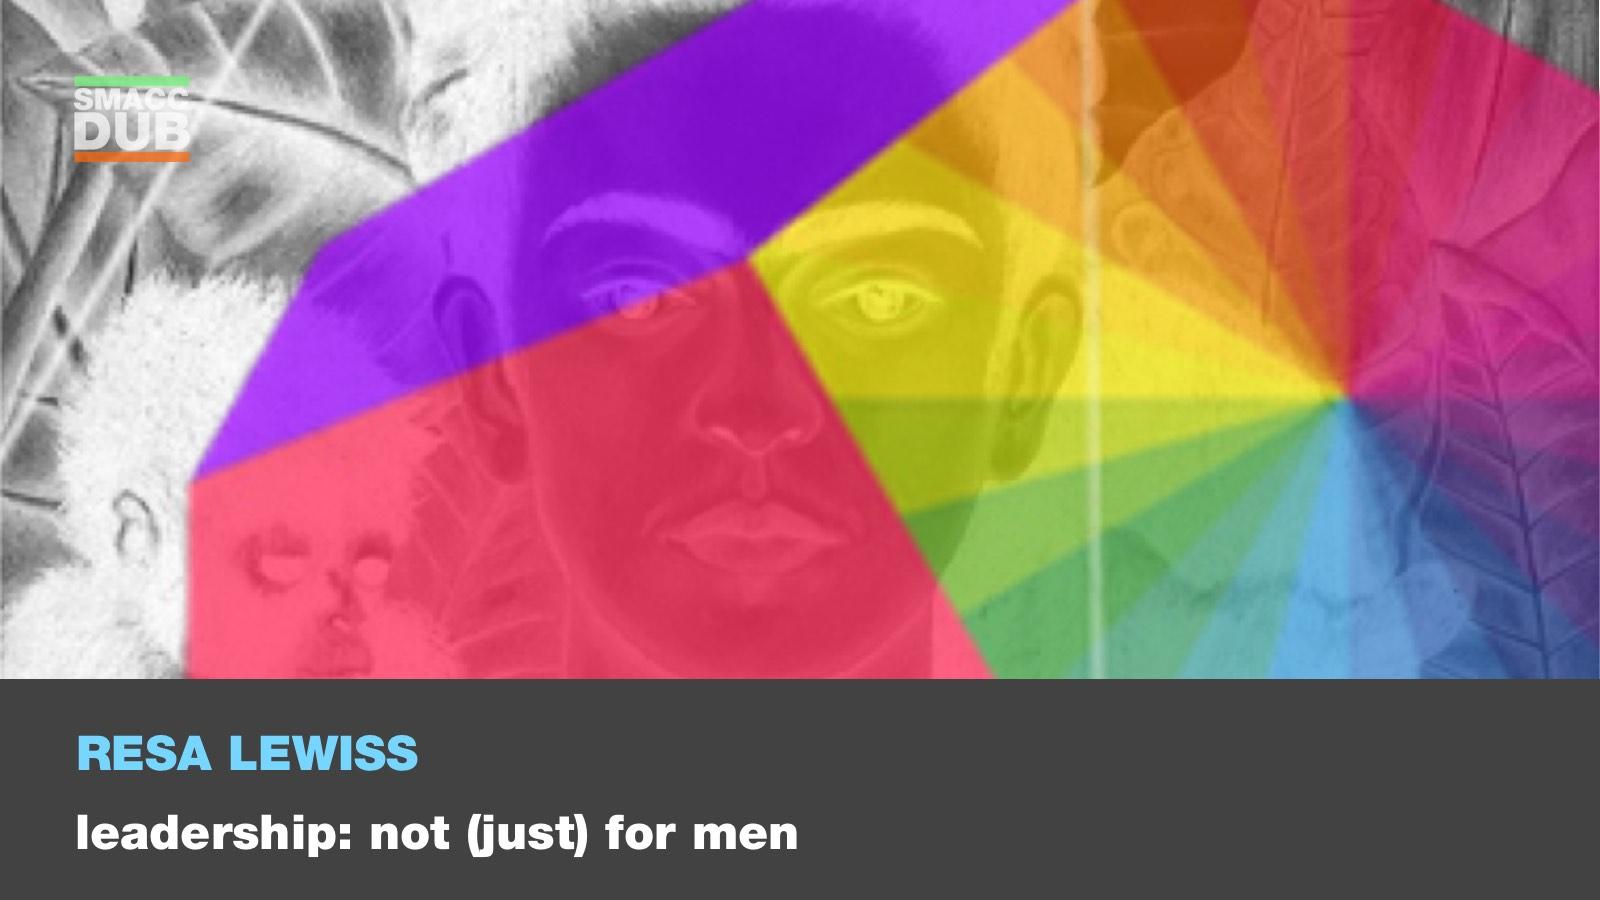 Leadership not just for men